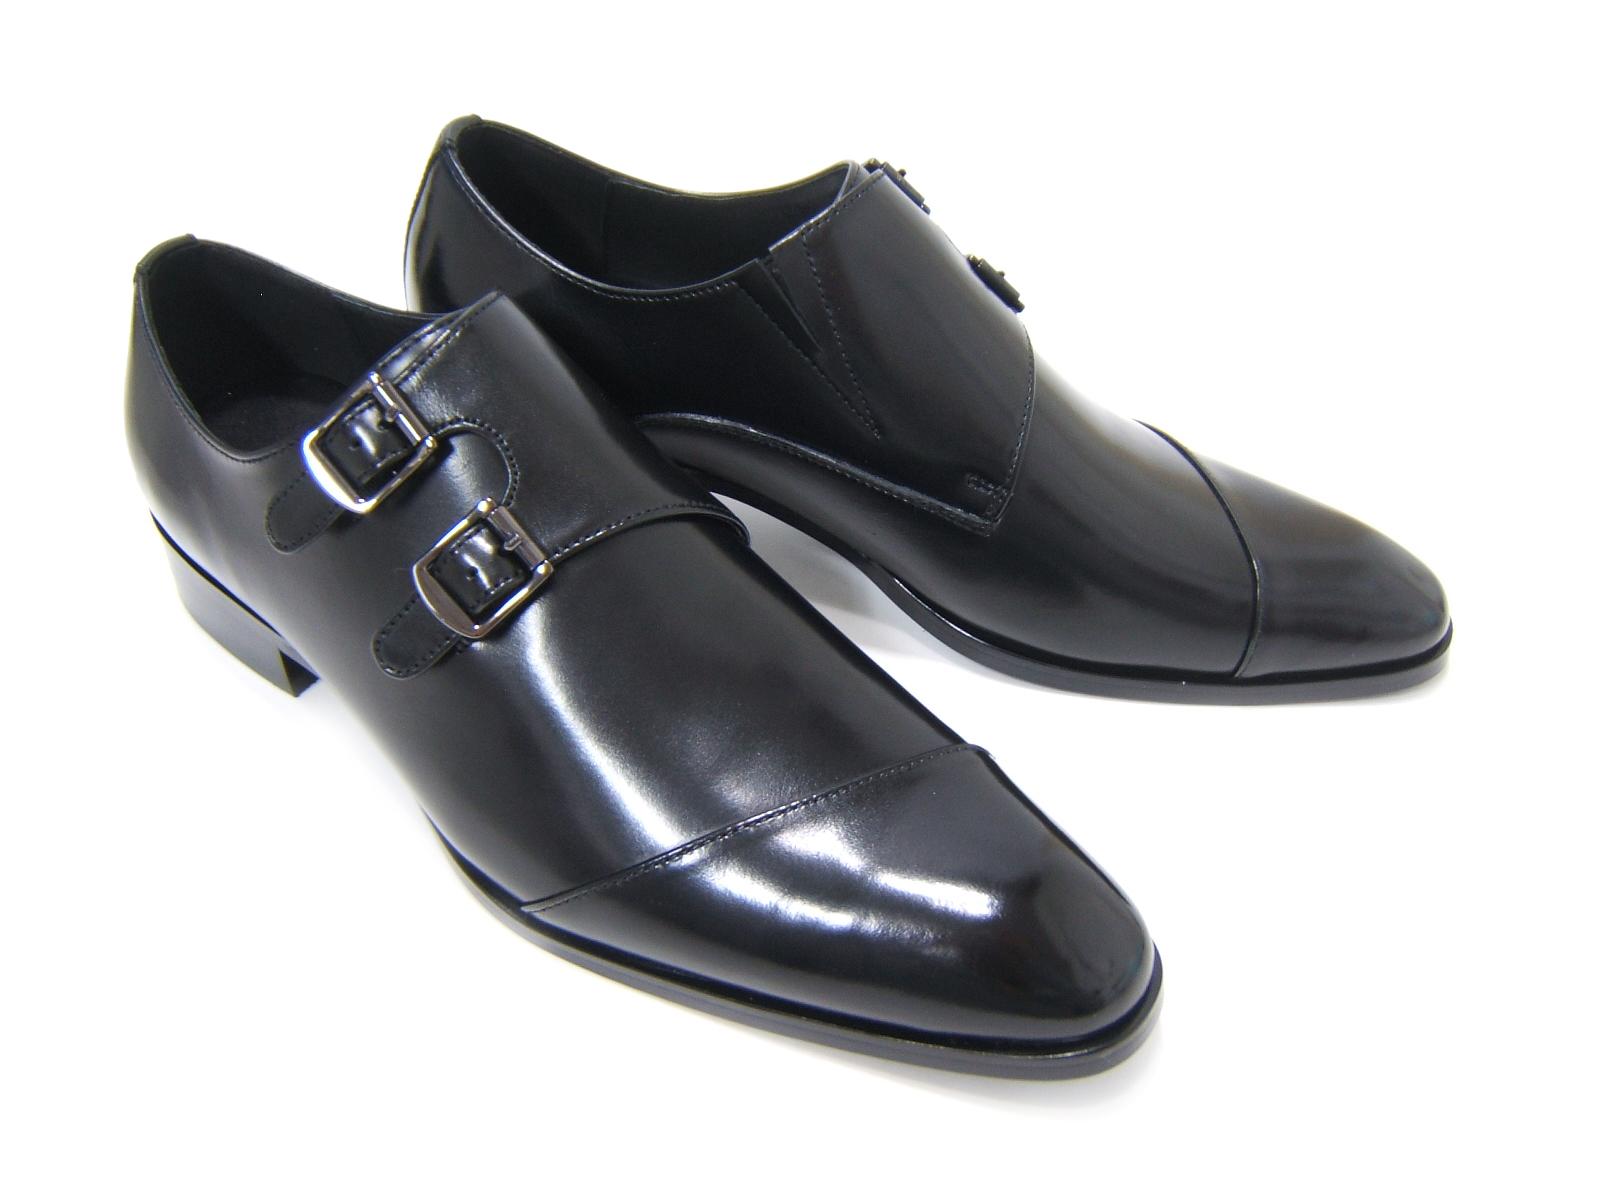 【TH57】【FRANCO LUZI】【送料無料】日本製アッパー全て本革☆撥水ダブルモンクビジネスシューズ紳士靴